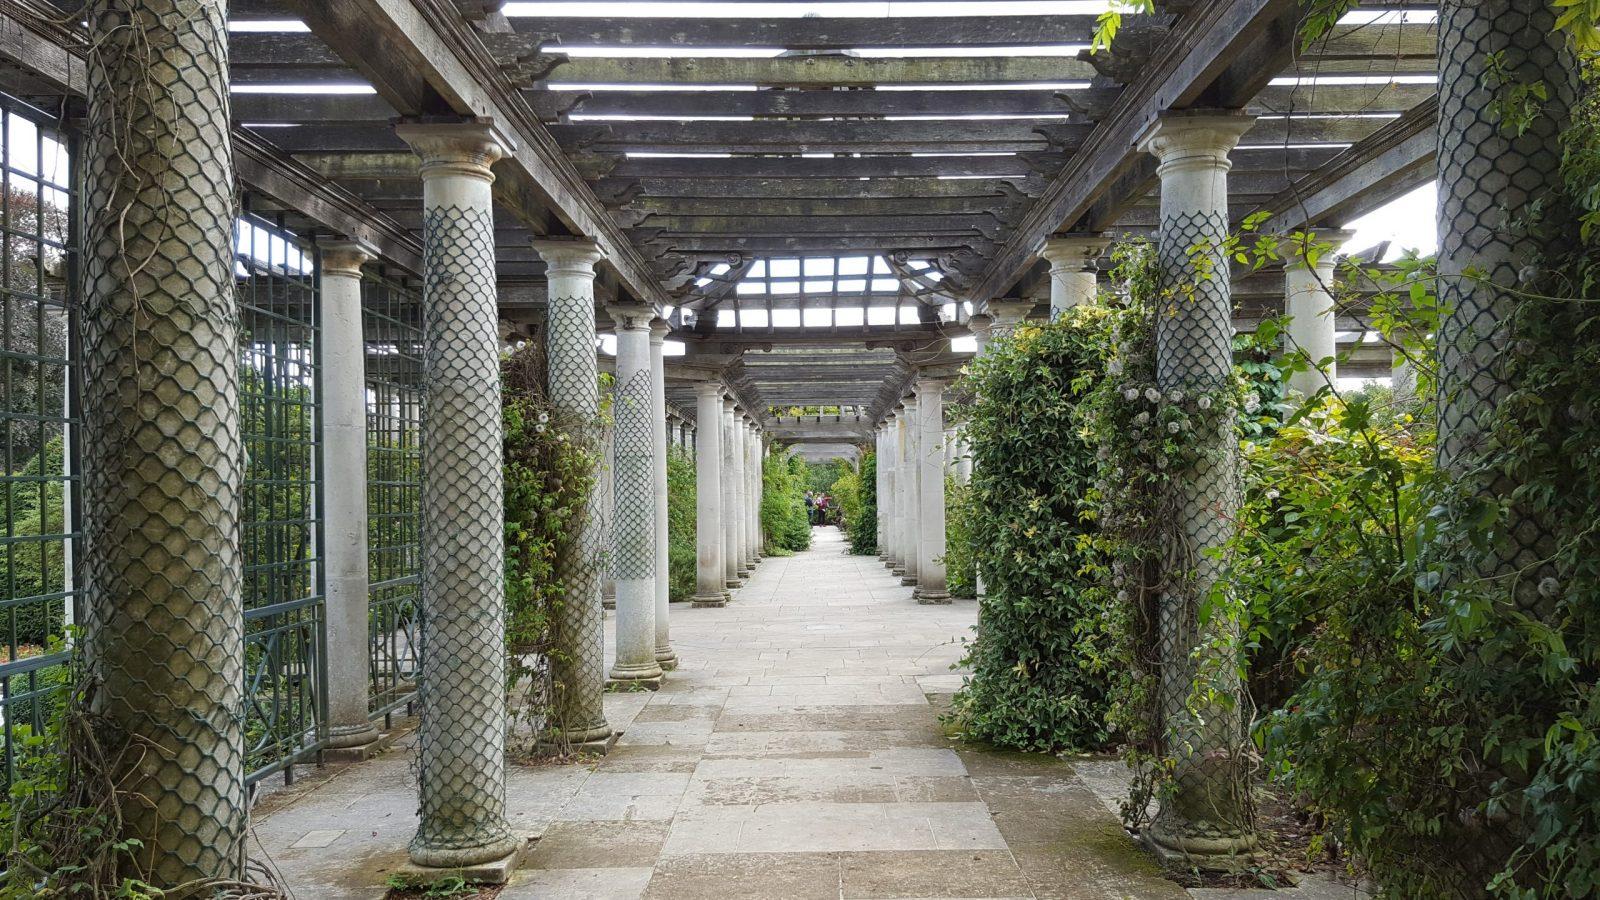 Visiting Hill Garden & Pergola, Hampstead Heath: Photo Gallery 10